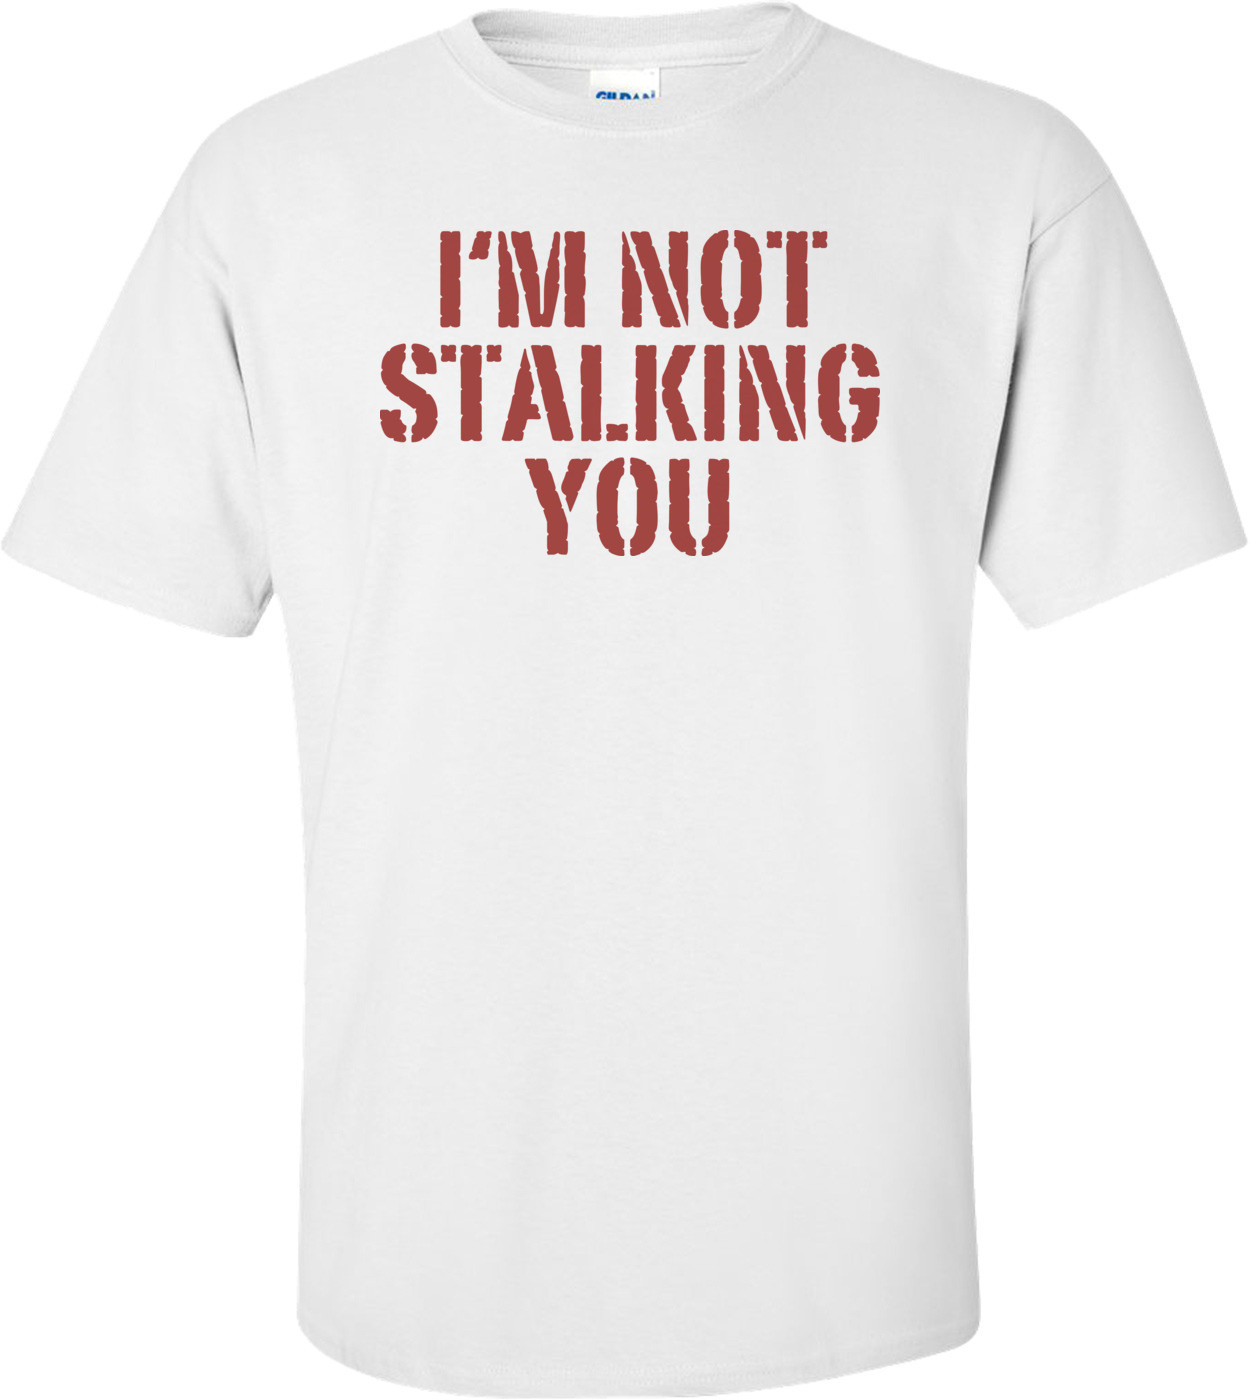 I'm Not Stalking You